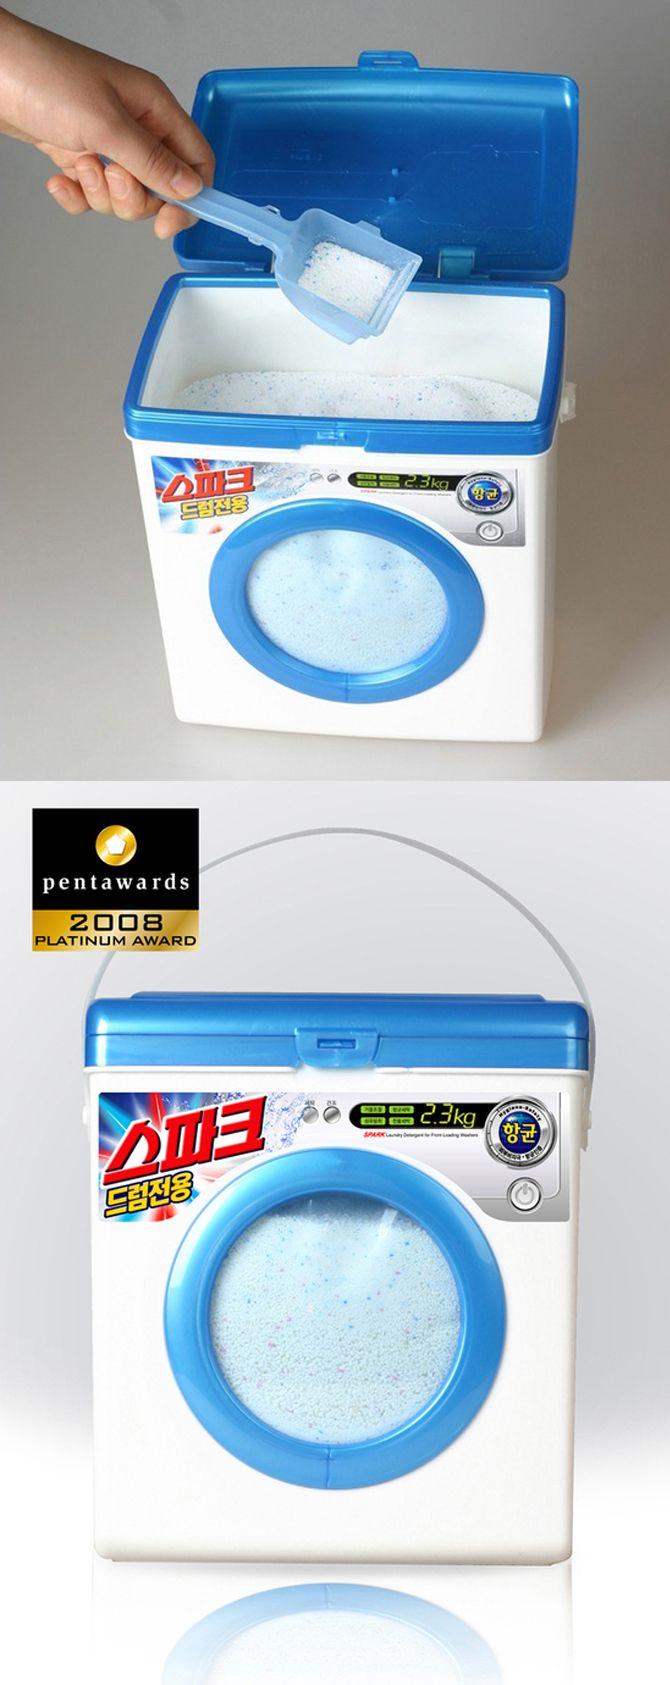 Washing Machine - Laundry Soap Packaging!